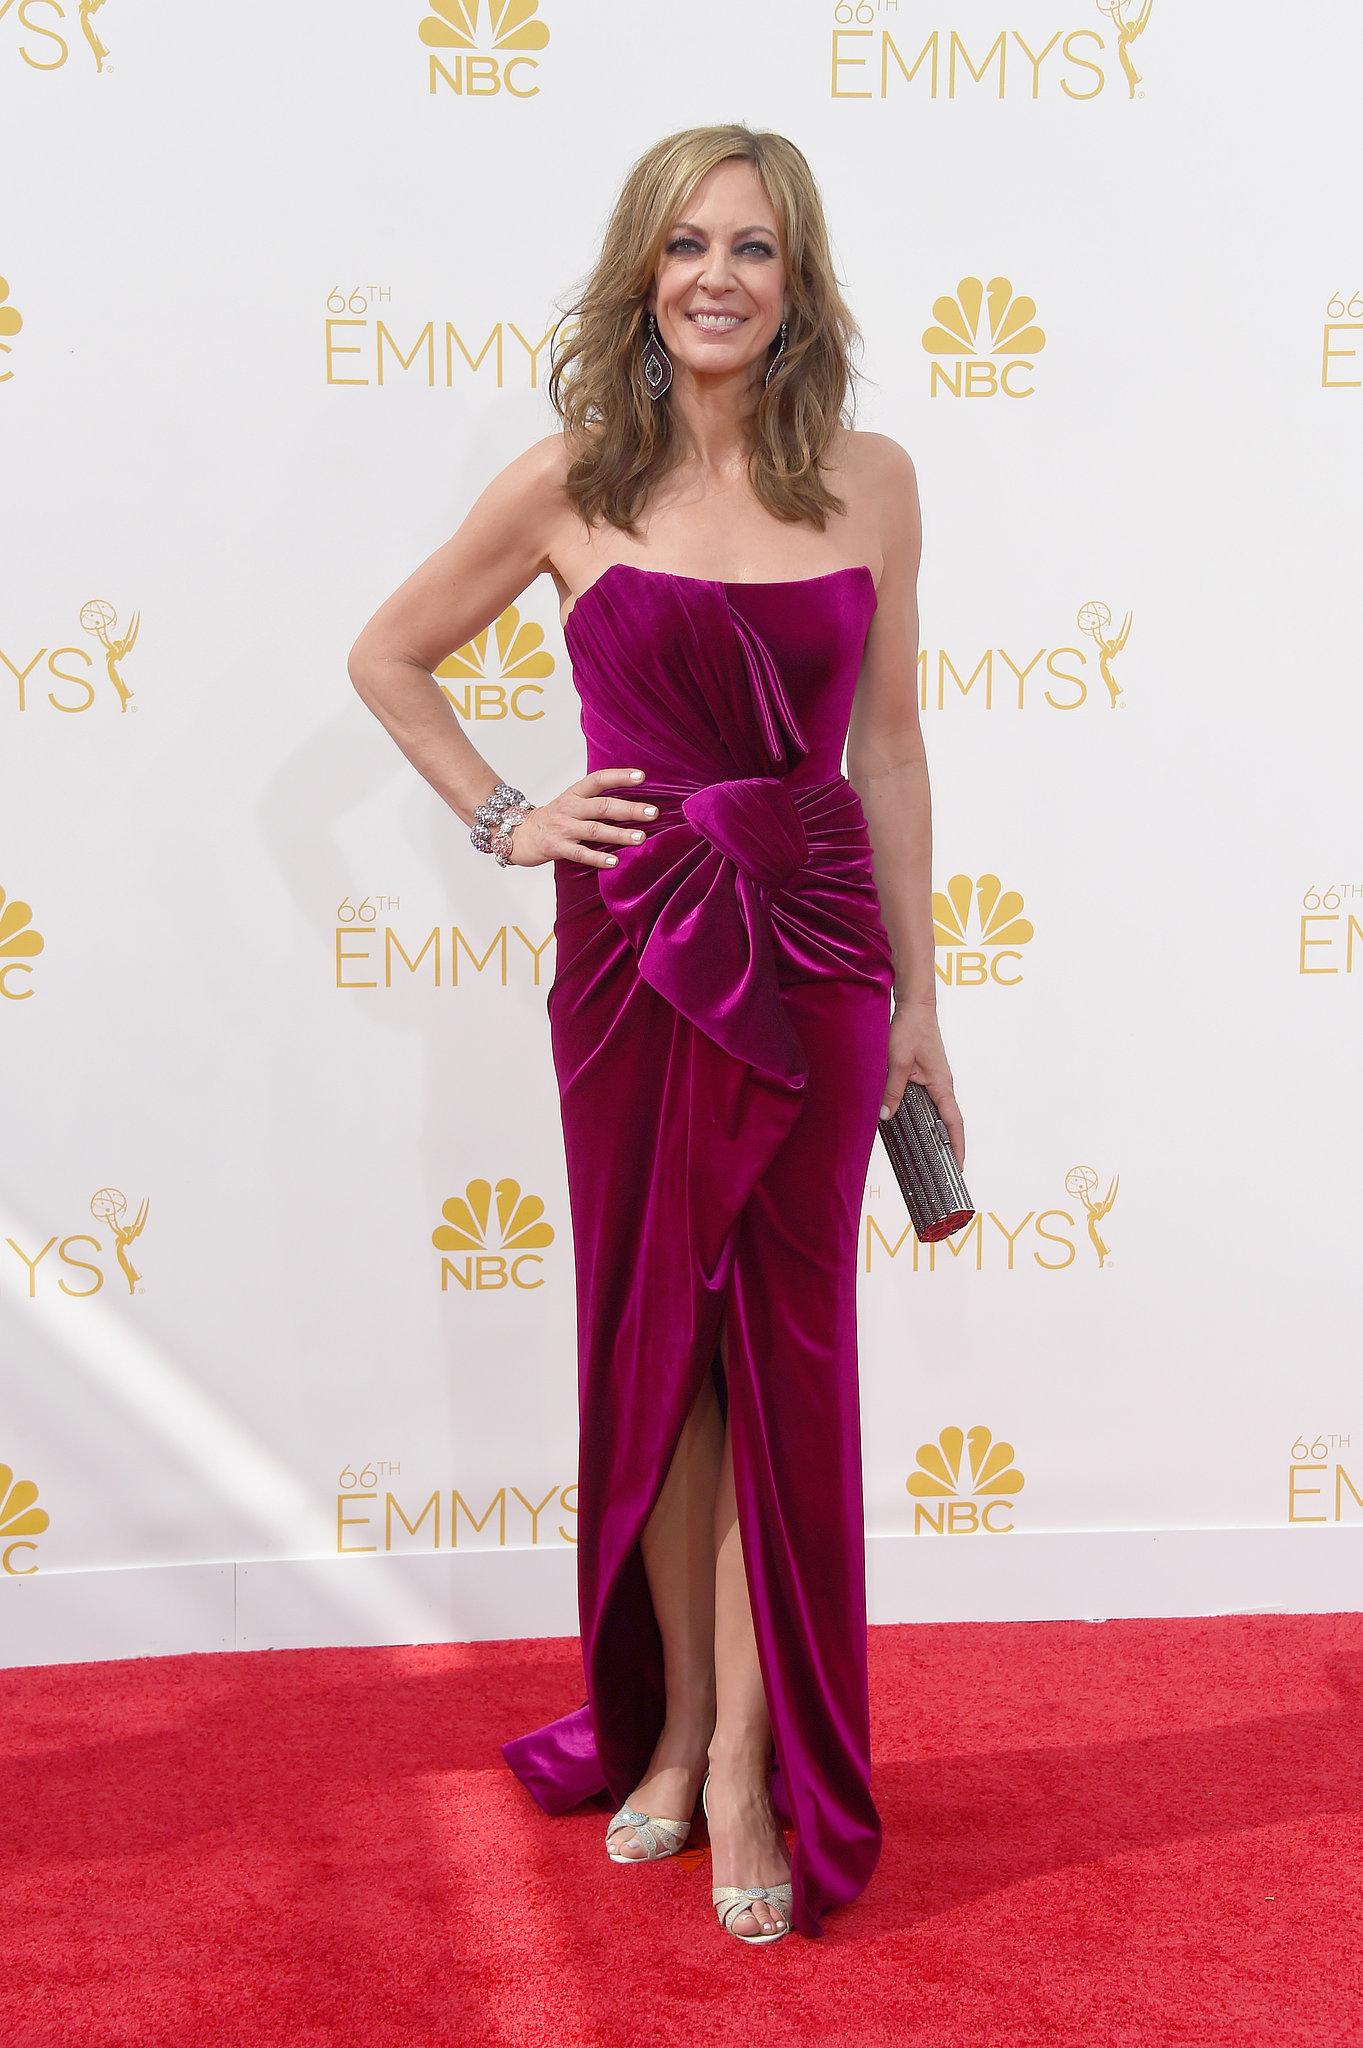 Allison Janney at the 2014 Emmy Awards